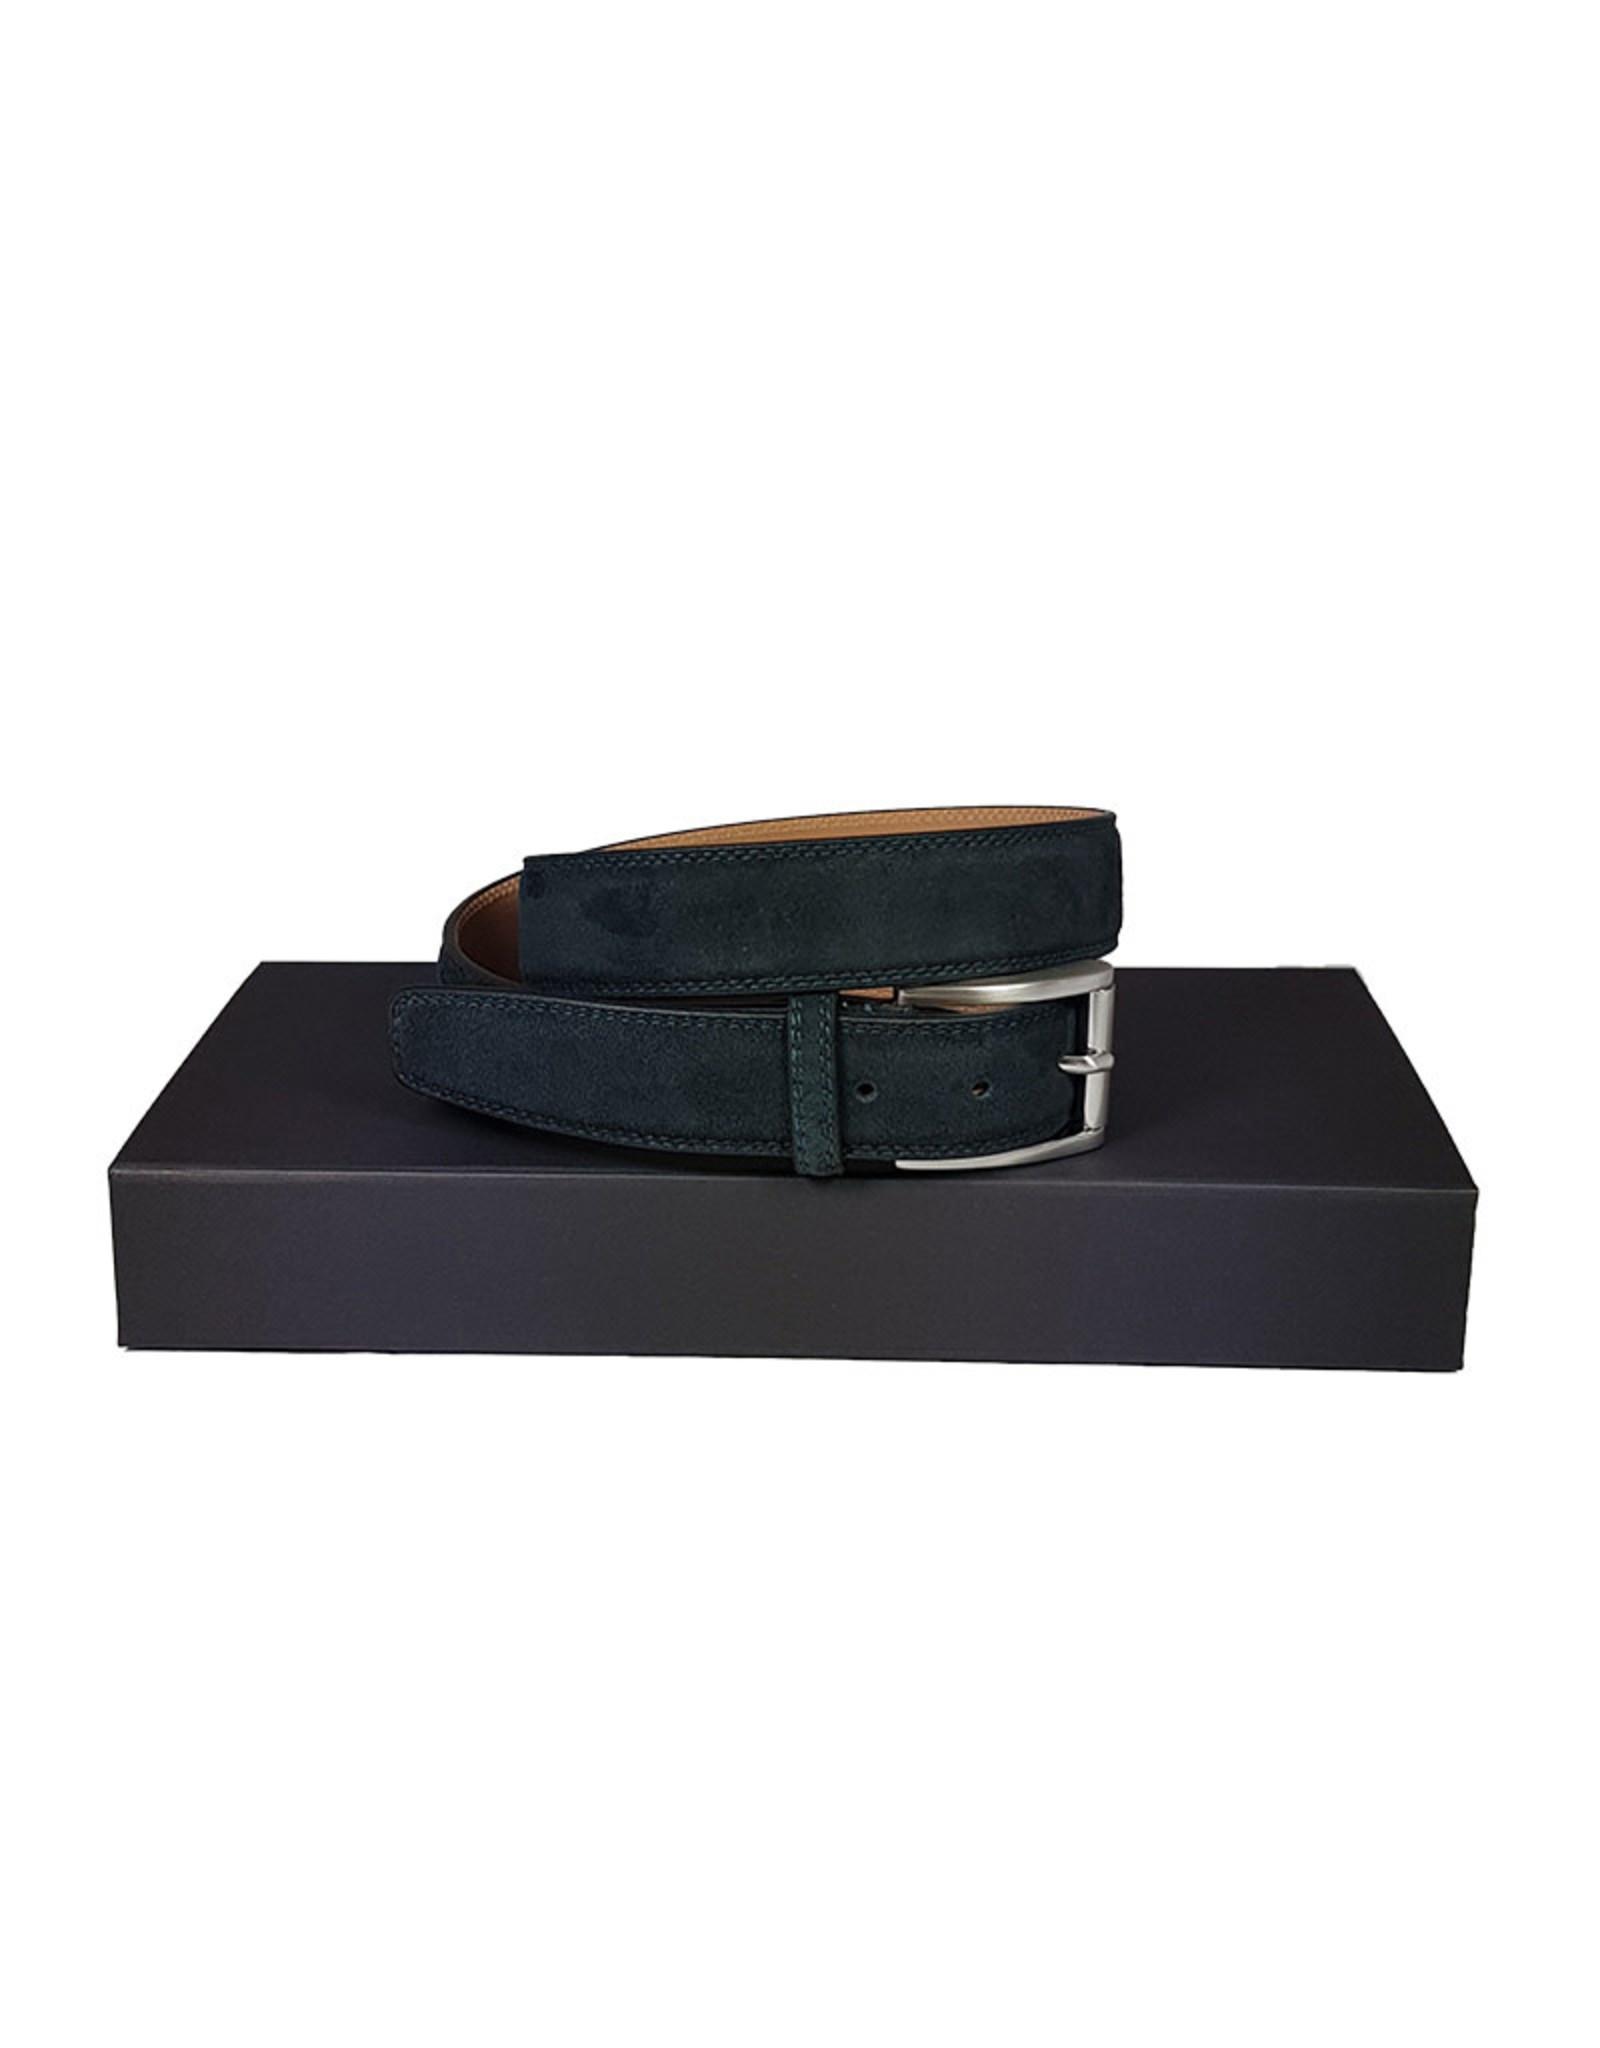 Belts+ Belts+ riem daim blauw Spaccato 20310/690